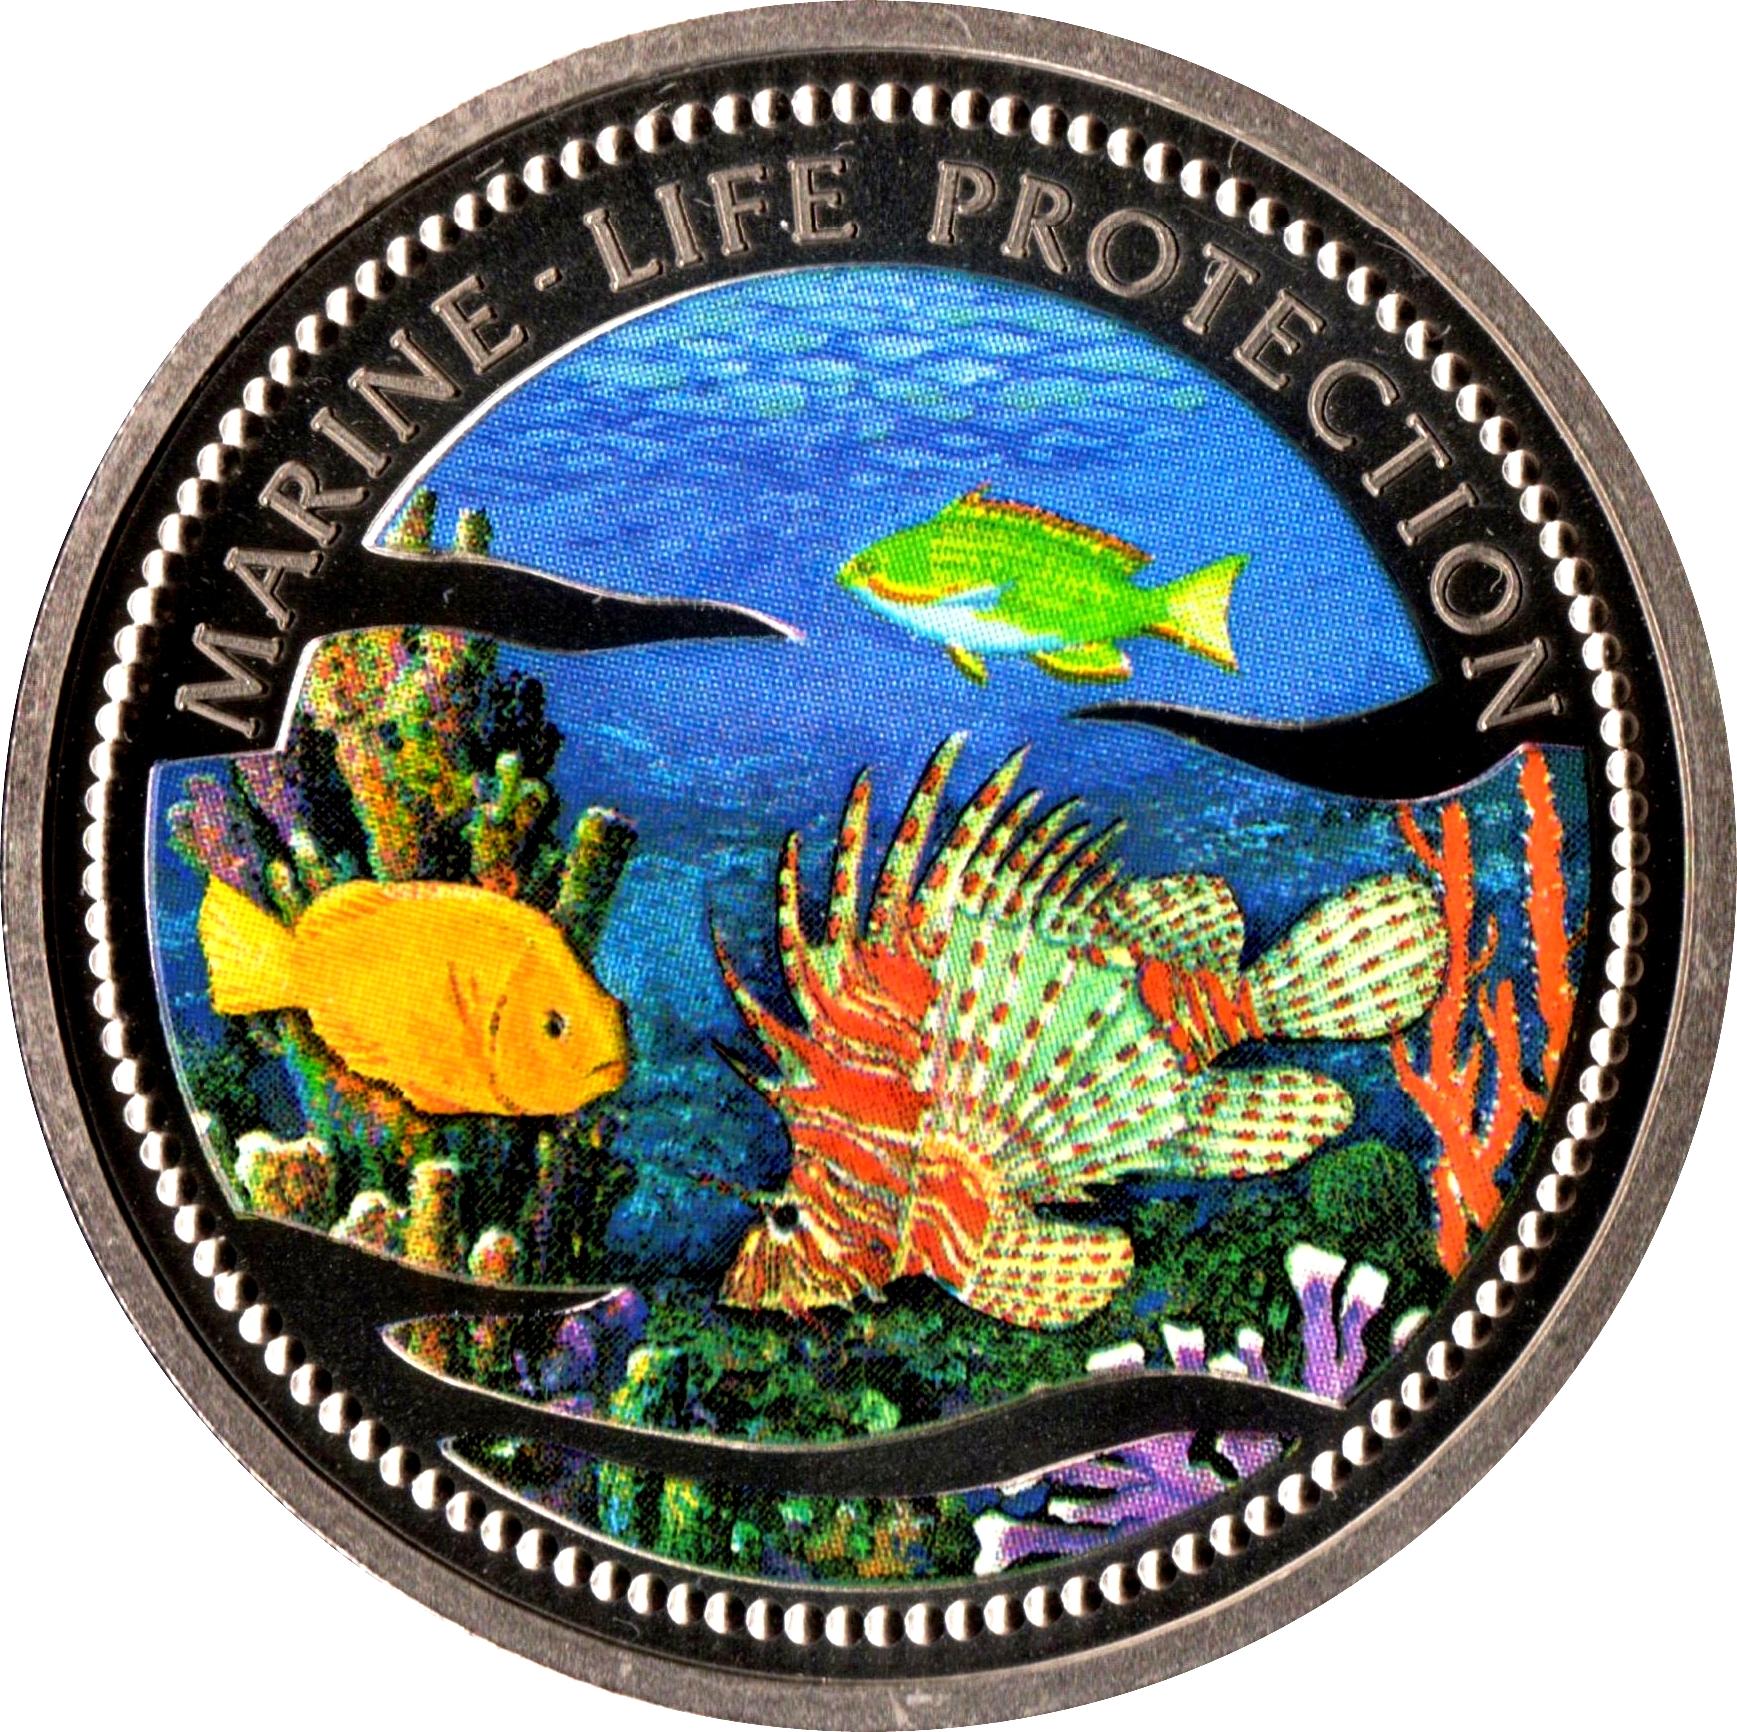 wildlife animal Mermaid BU coin 2000 Palau 1 dollar Lion fish